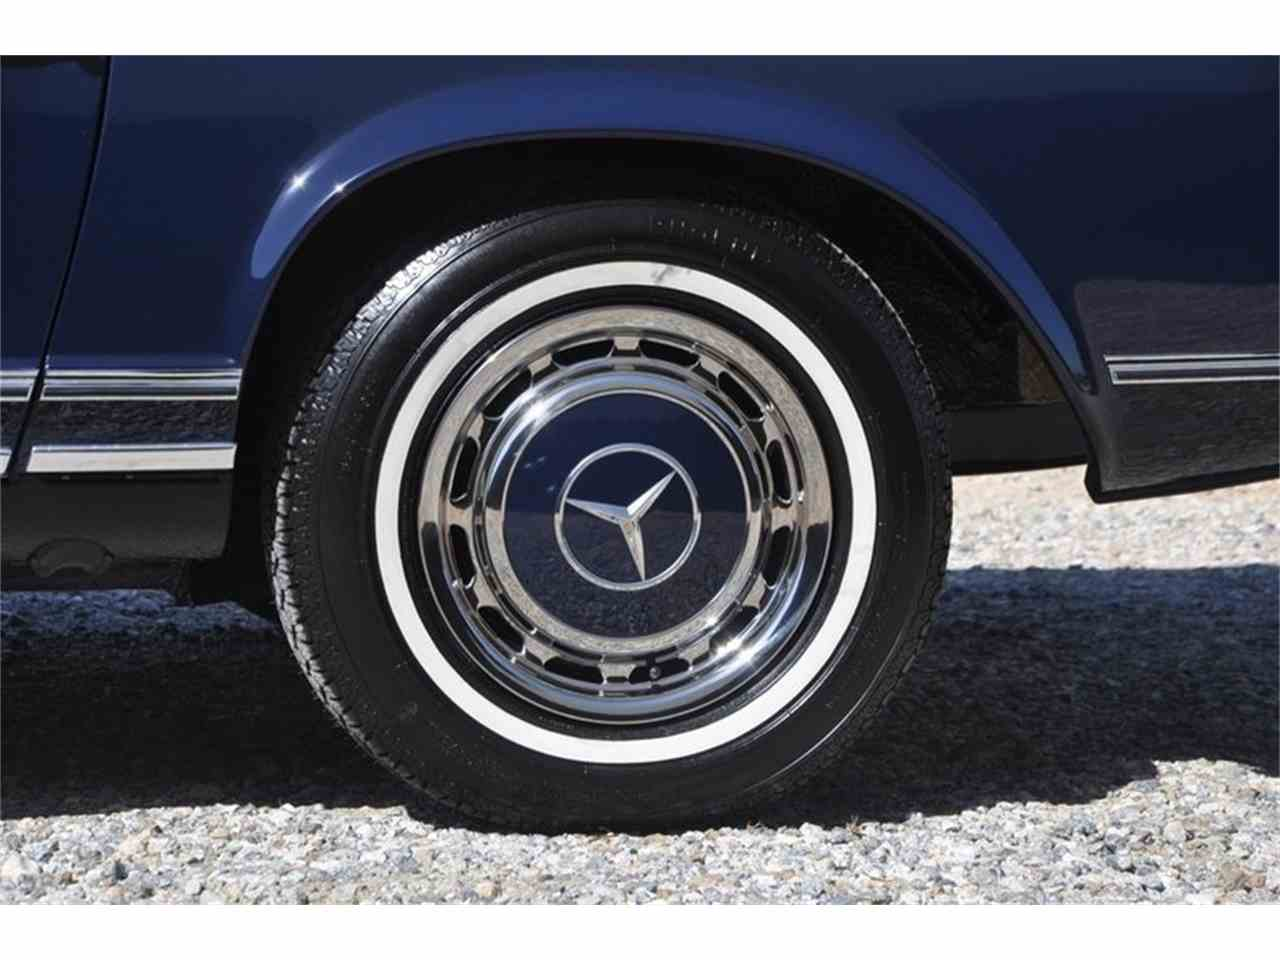 Large Picture of Classic '69 Mercedes-Benz 280SL located in California - $169,500.00 - JFPJ